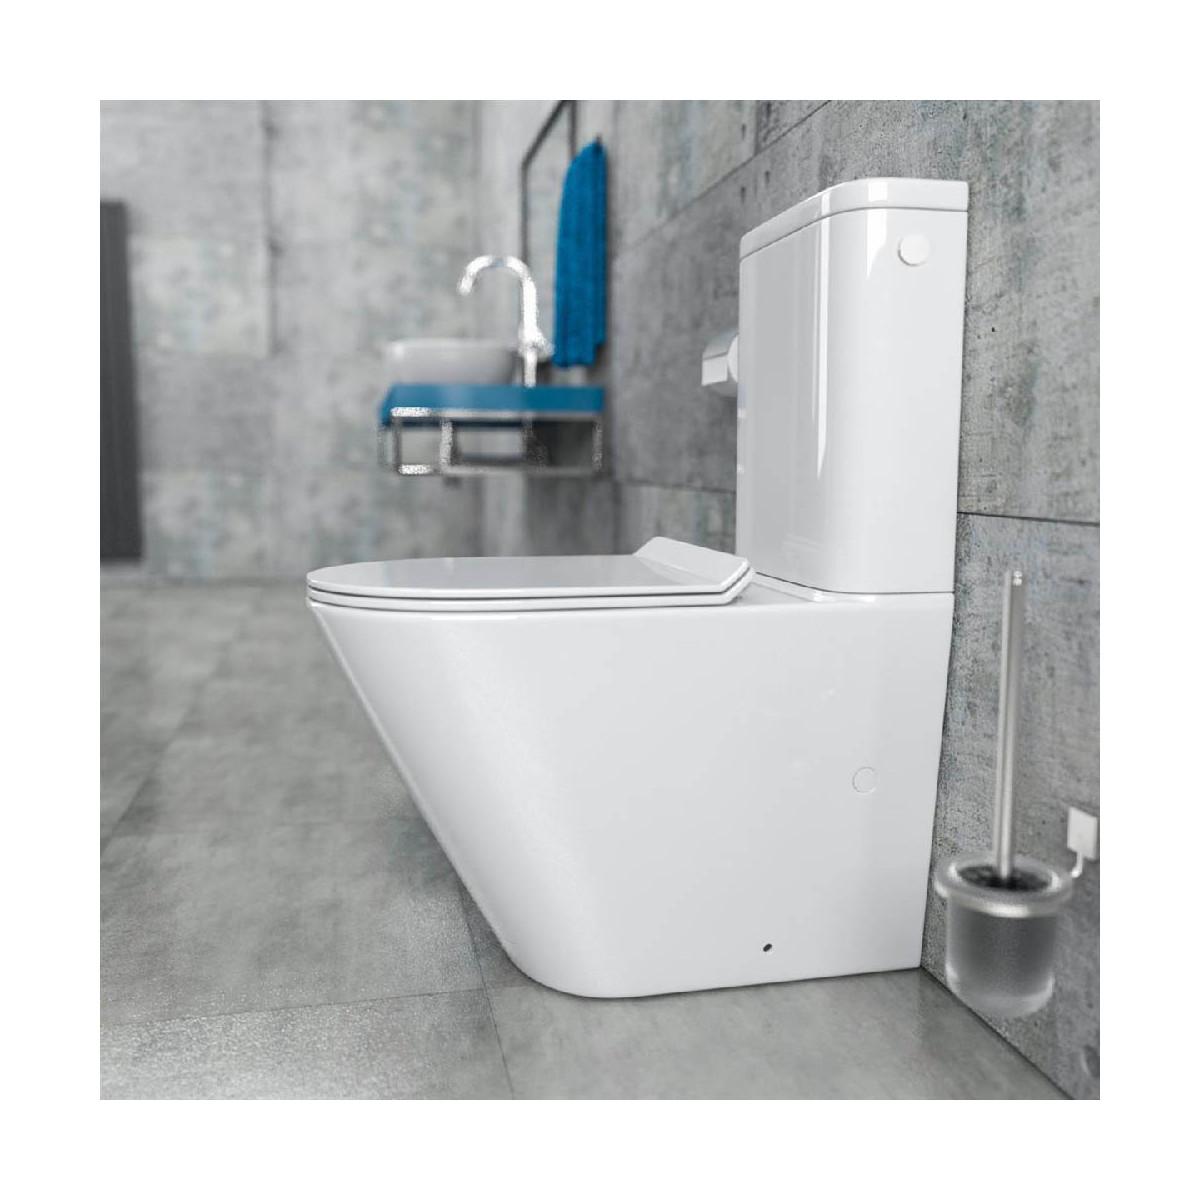 stand wc kombination randlos kb6093b 229 90. Black Bedroom Furniture Sets. Home Design Ideas